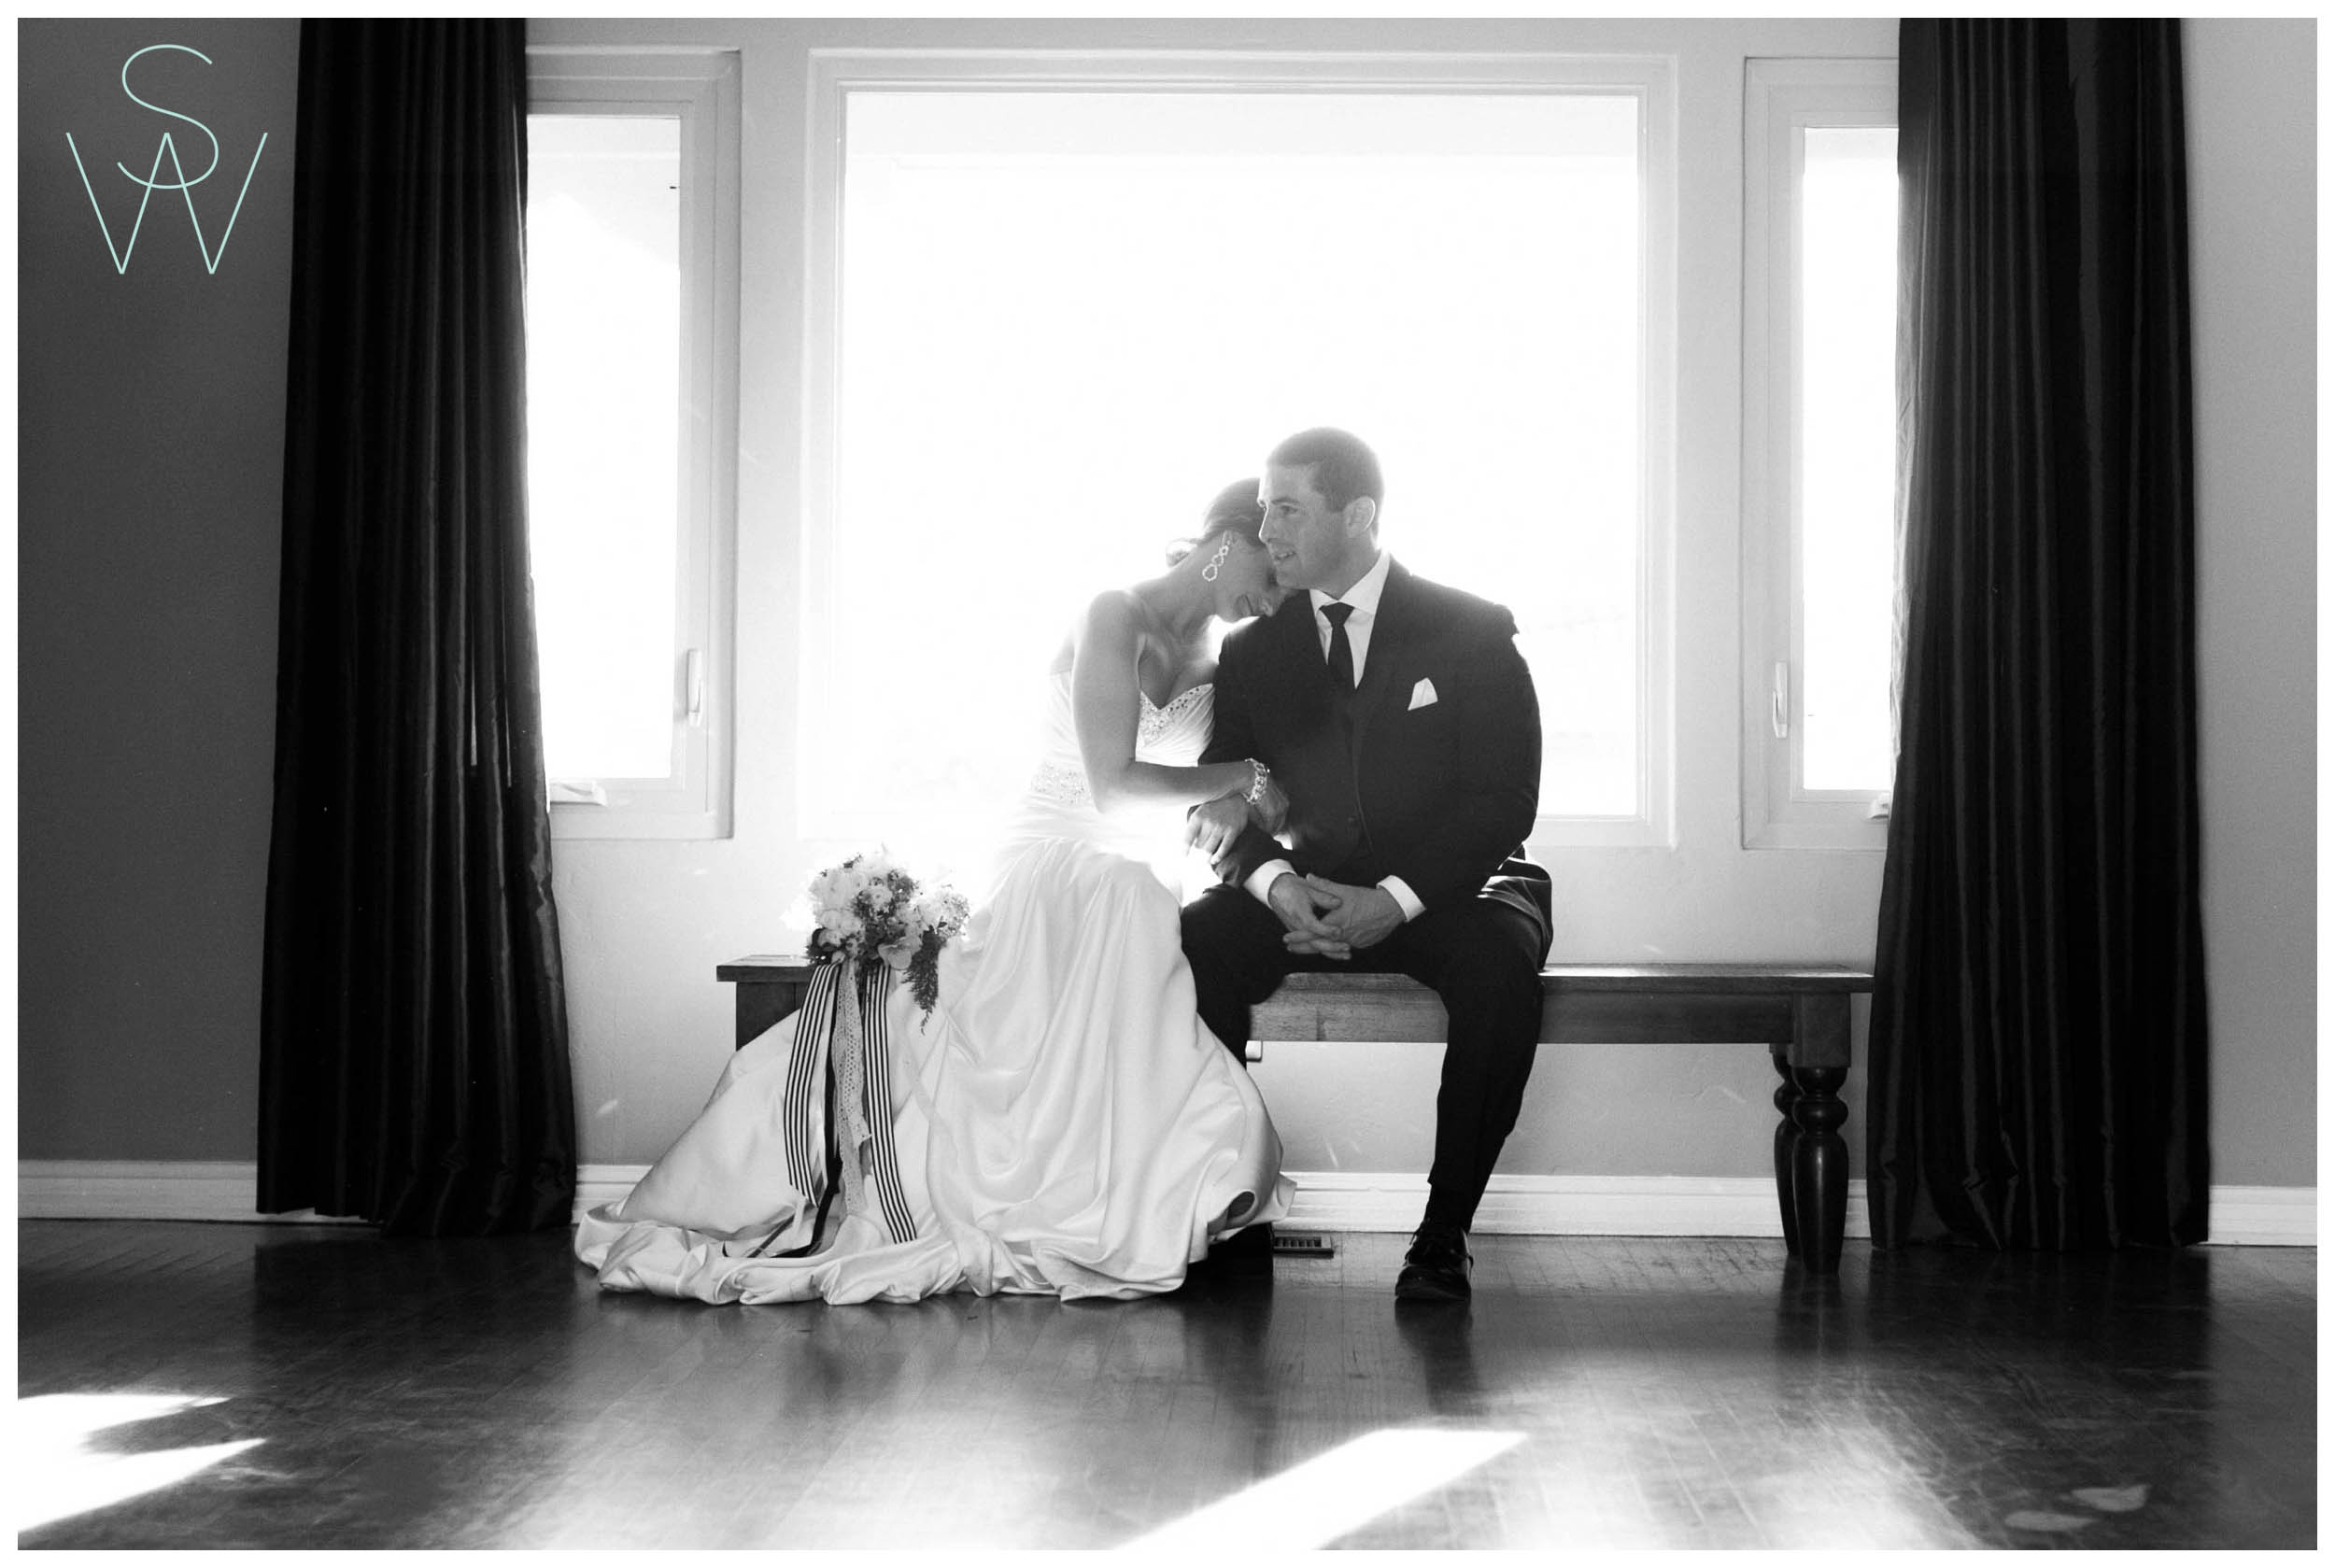 Shewanders.sdma_.wedding.photography-1020.jpg.wedding.photography-1020.jpg